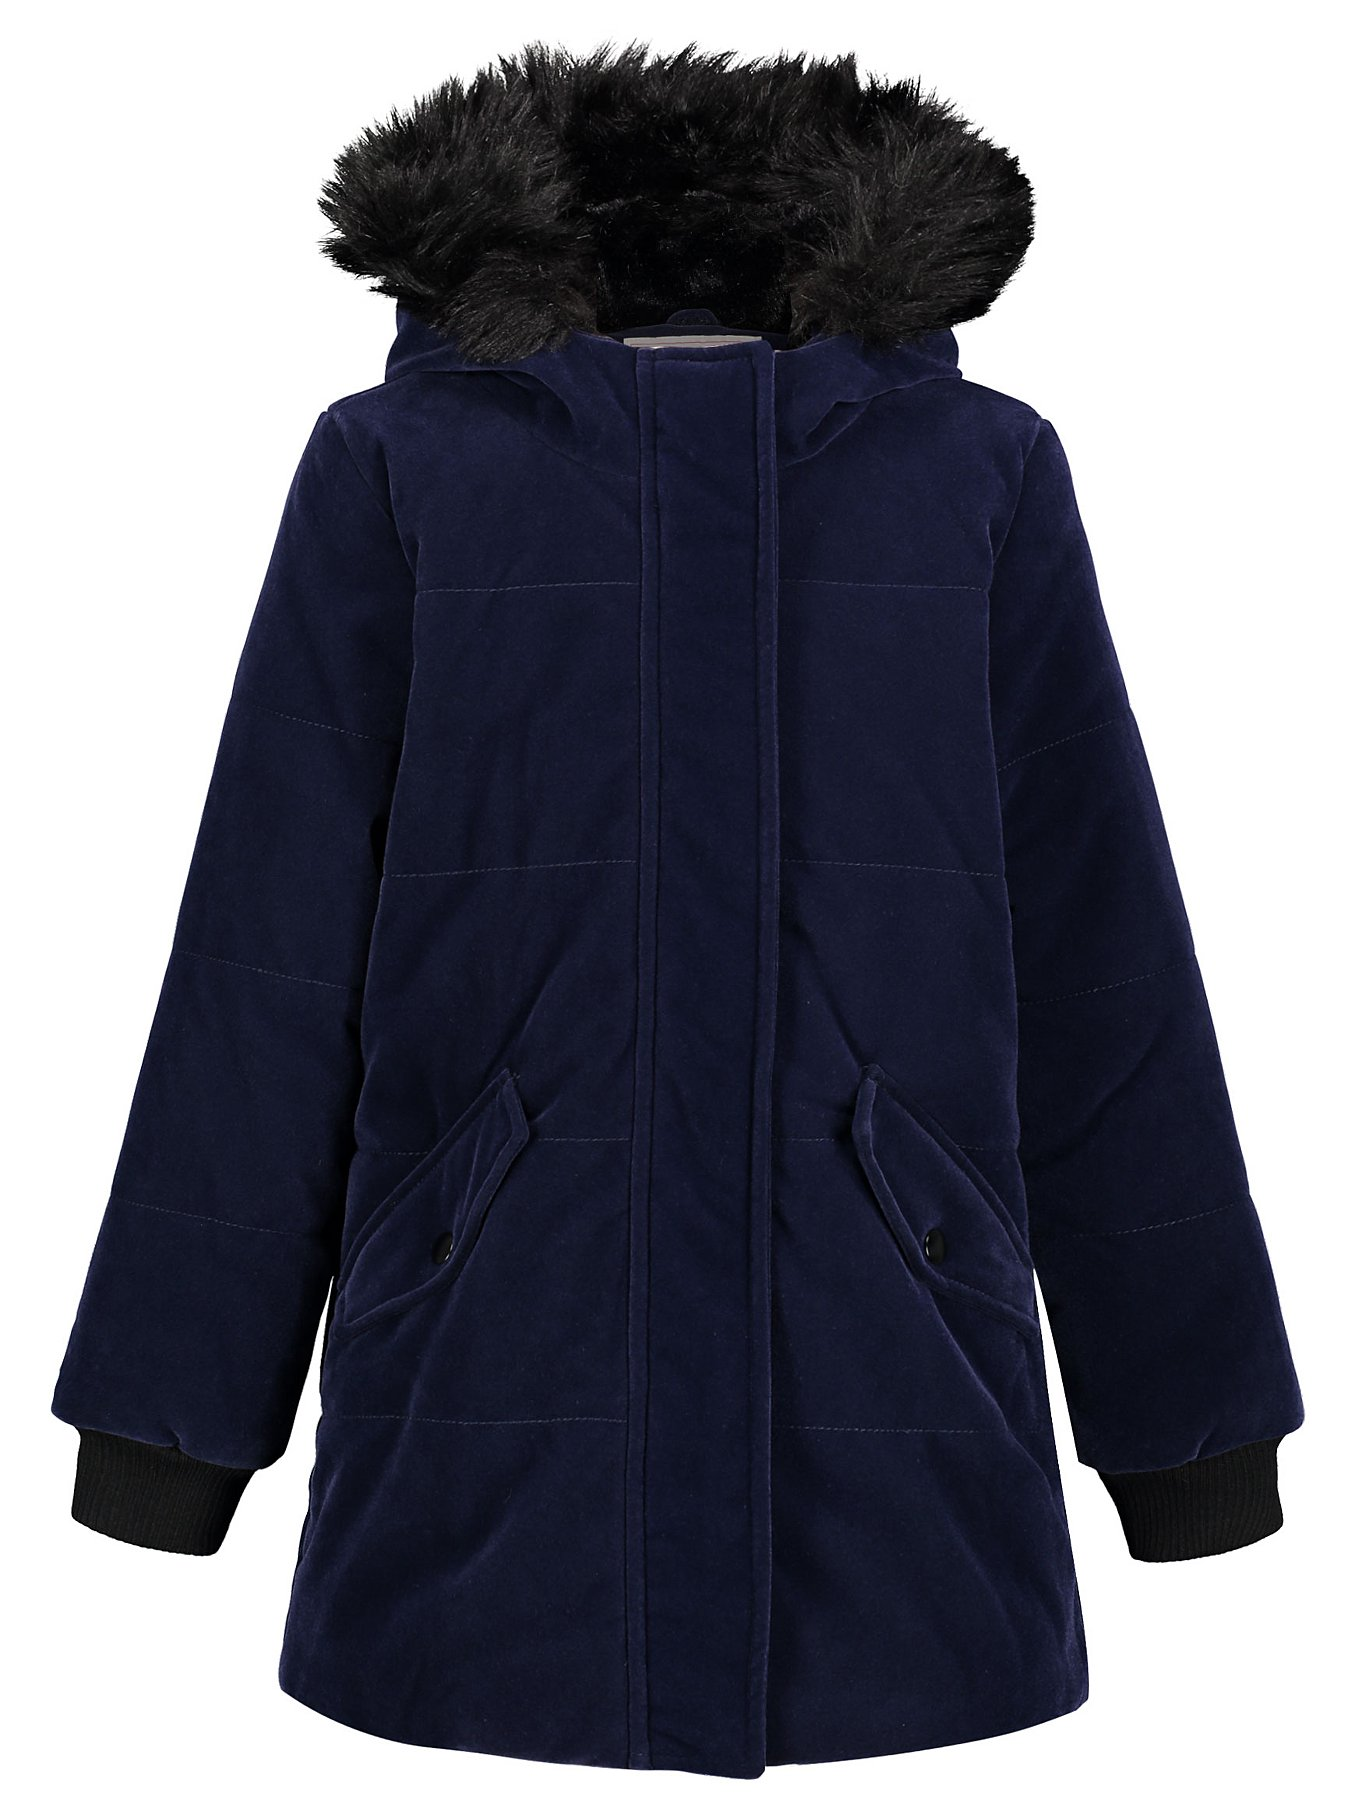 Coats & Jackets | Girls 4-14 Years | Kids | George at ASDA